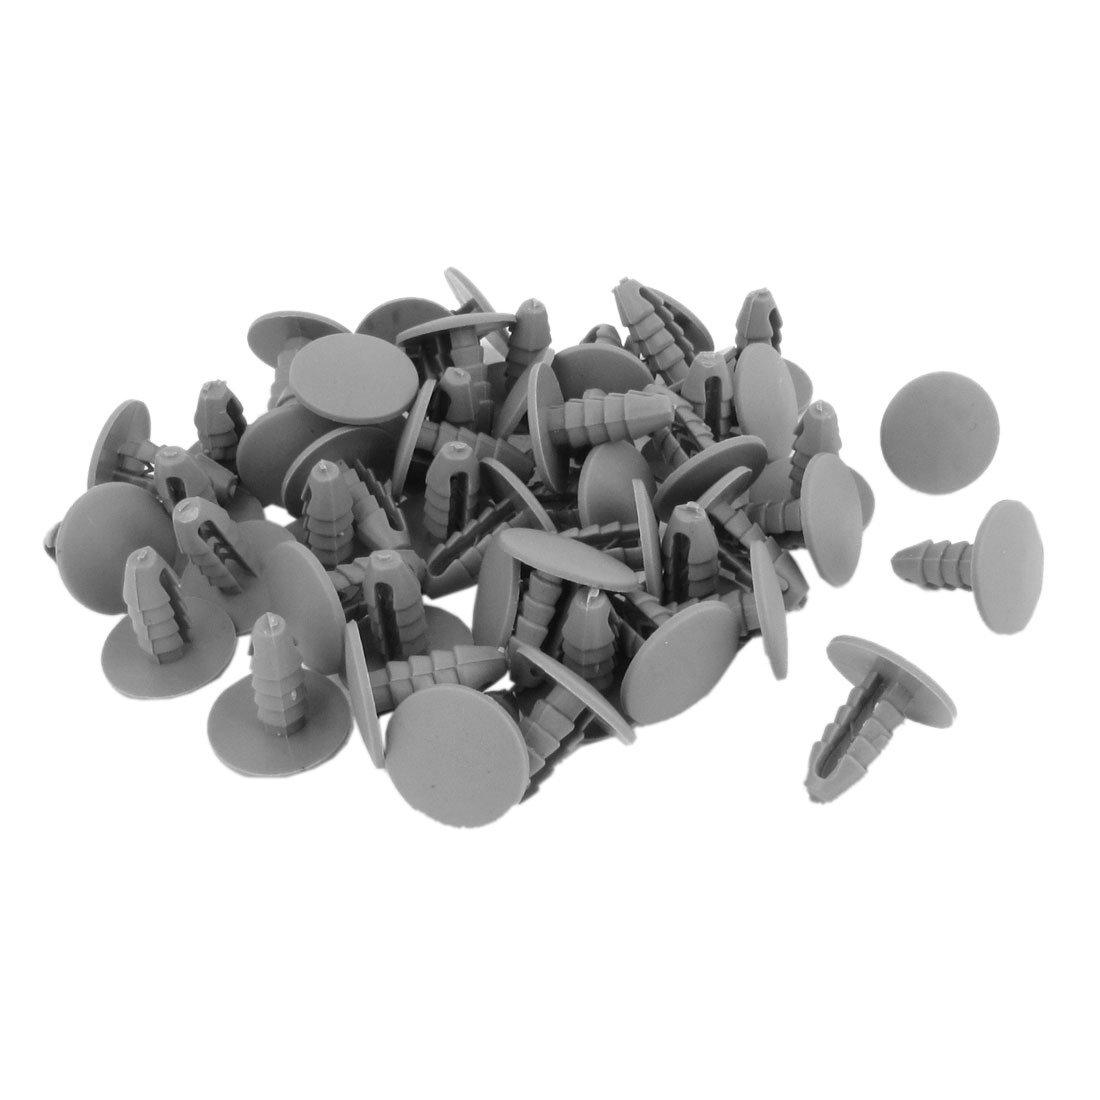 Plastic Rivet - SODIAL(R) 50PCS 8mm Hole Gray Plastic Rivet Door Push in CLip for Car